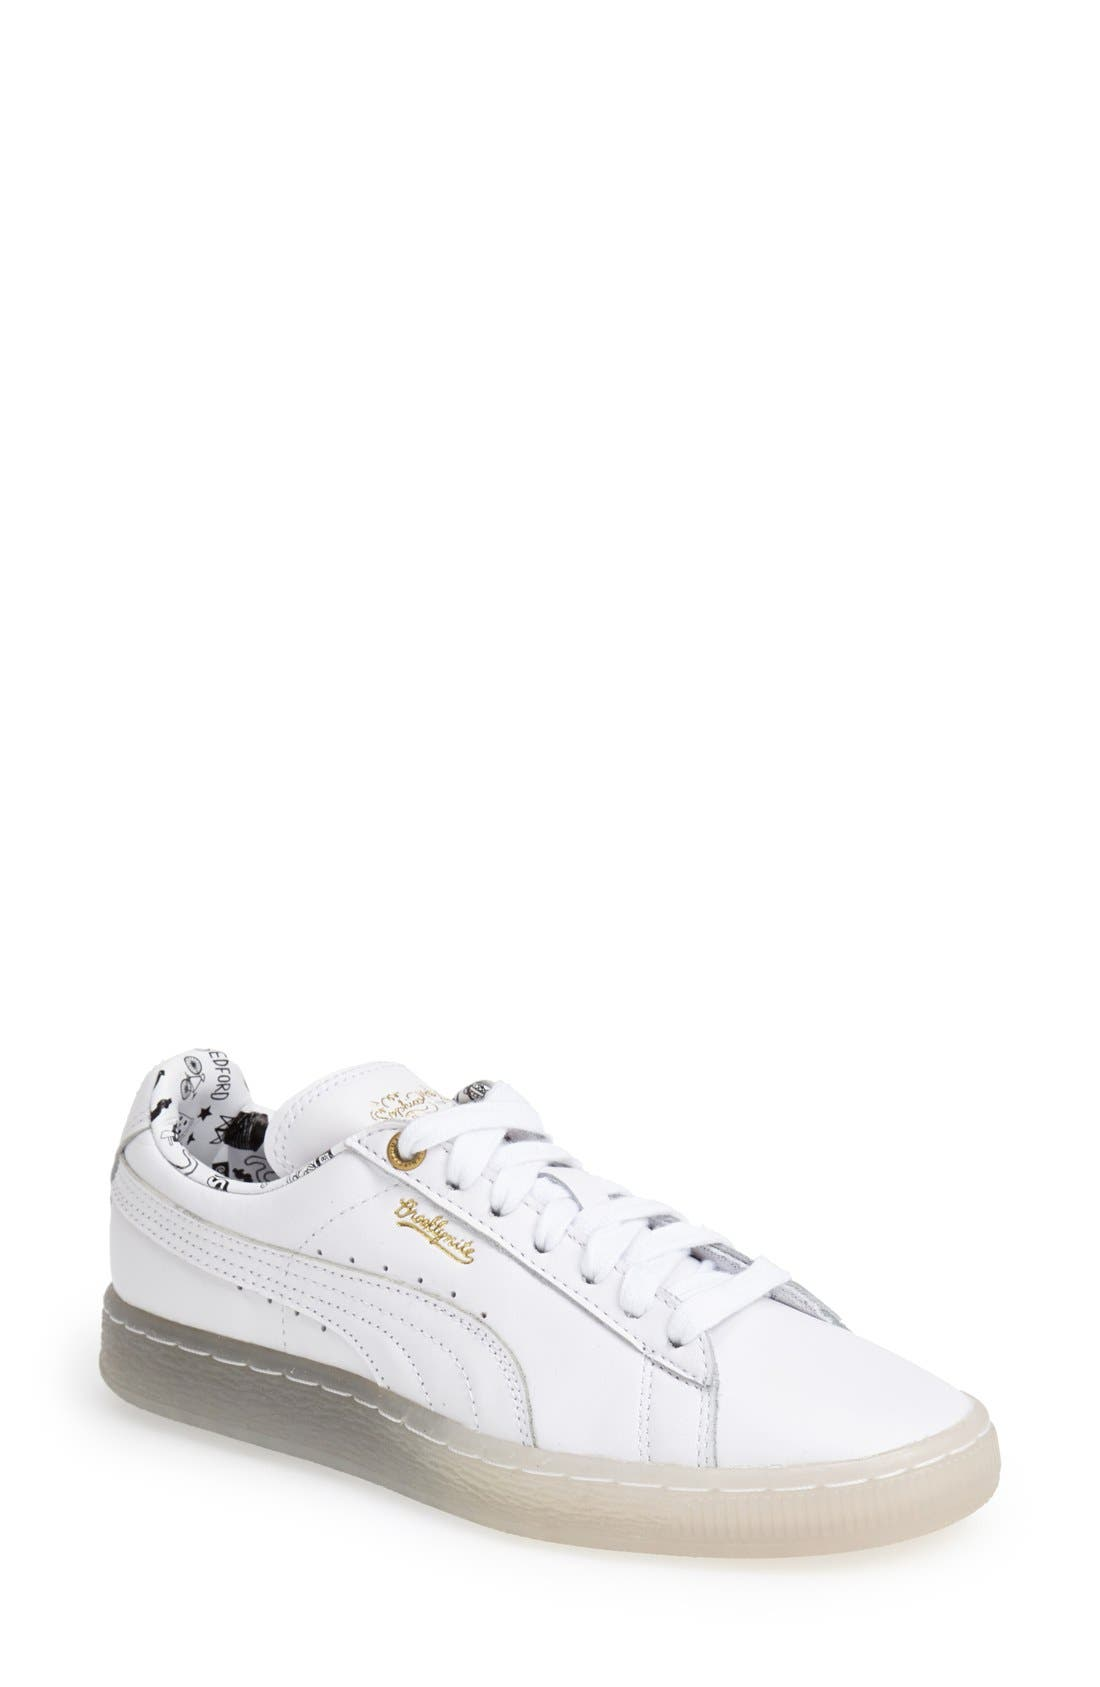 Main Image - PUMA 'Brooklynite - Sophia Chang' Classic Sneaker (Women)